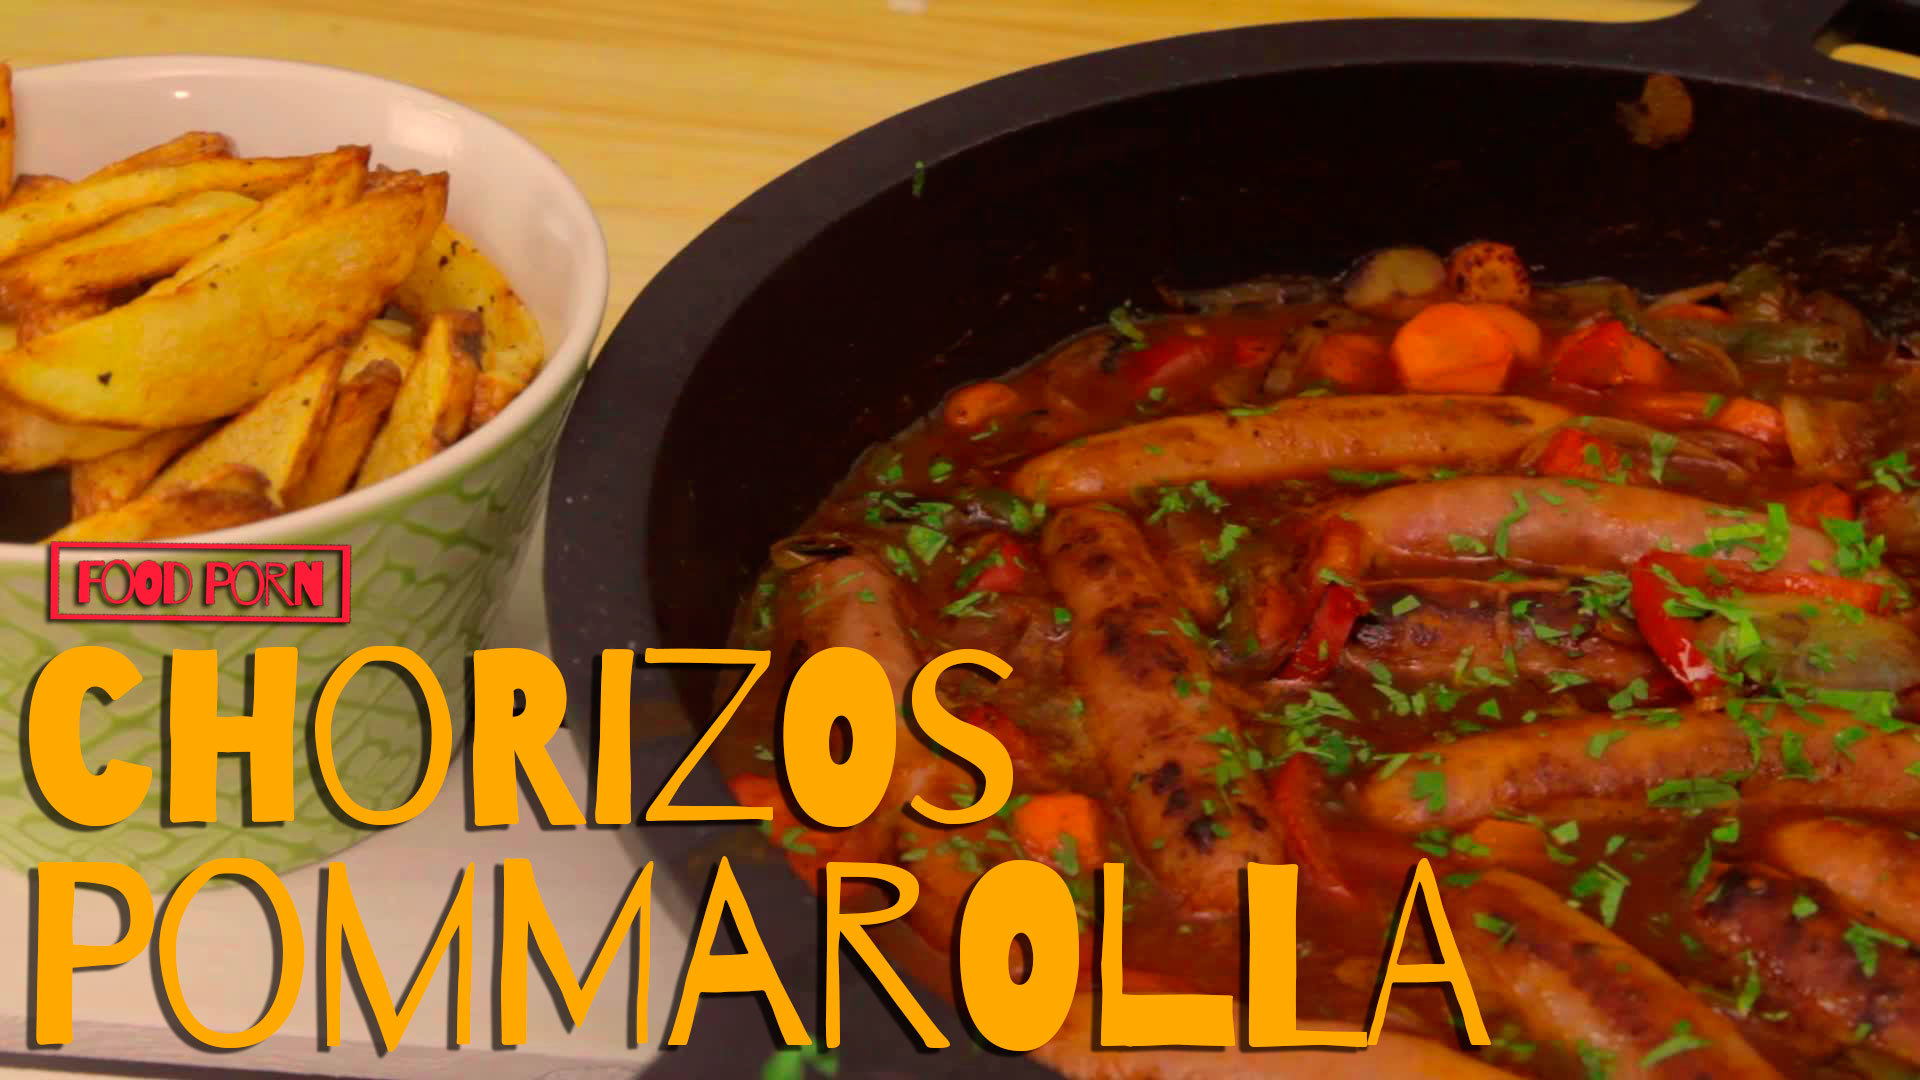 Temporada 1 Chorizos Pommarolla